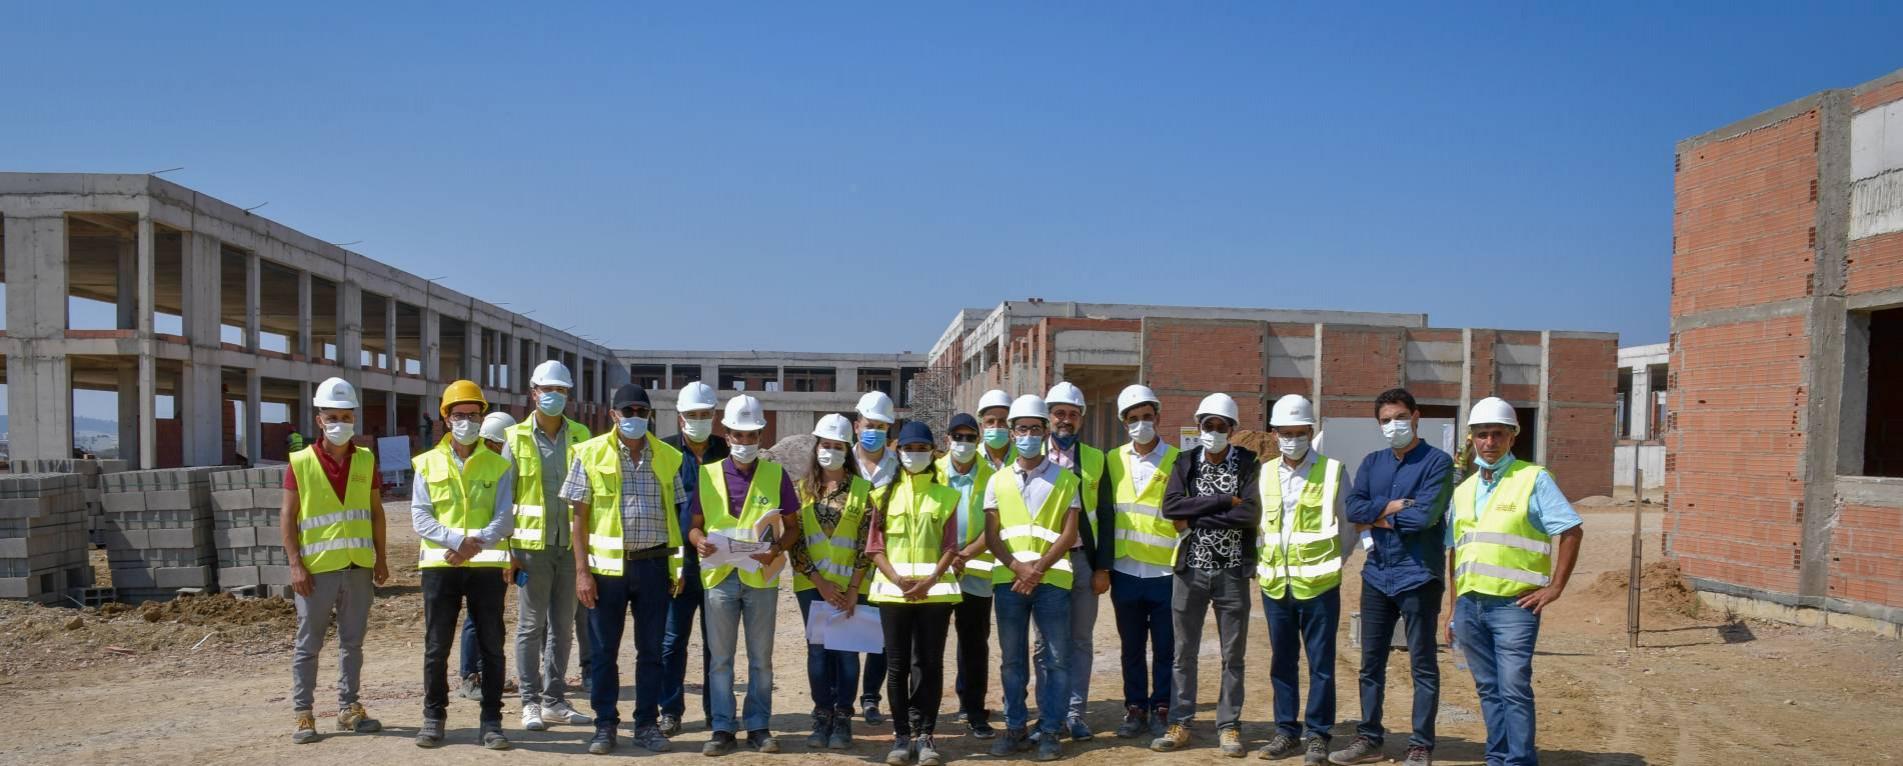 CMC de Tanger-Tetouan-Al Hoceima : avancement des travaux de 26.5%